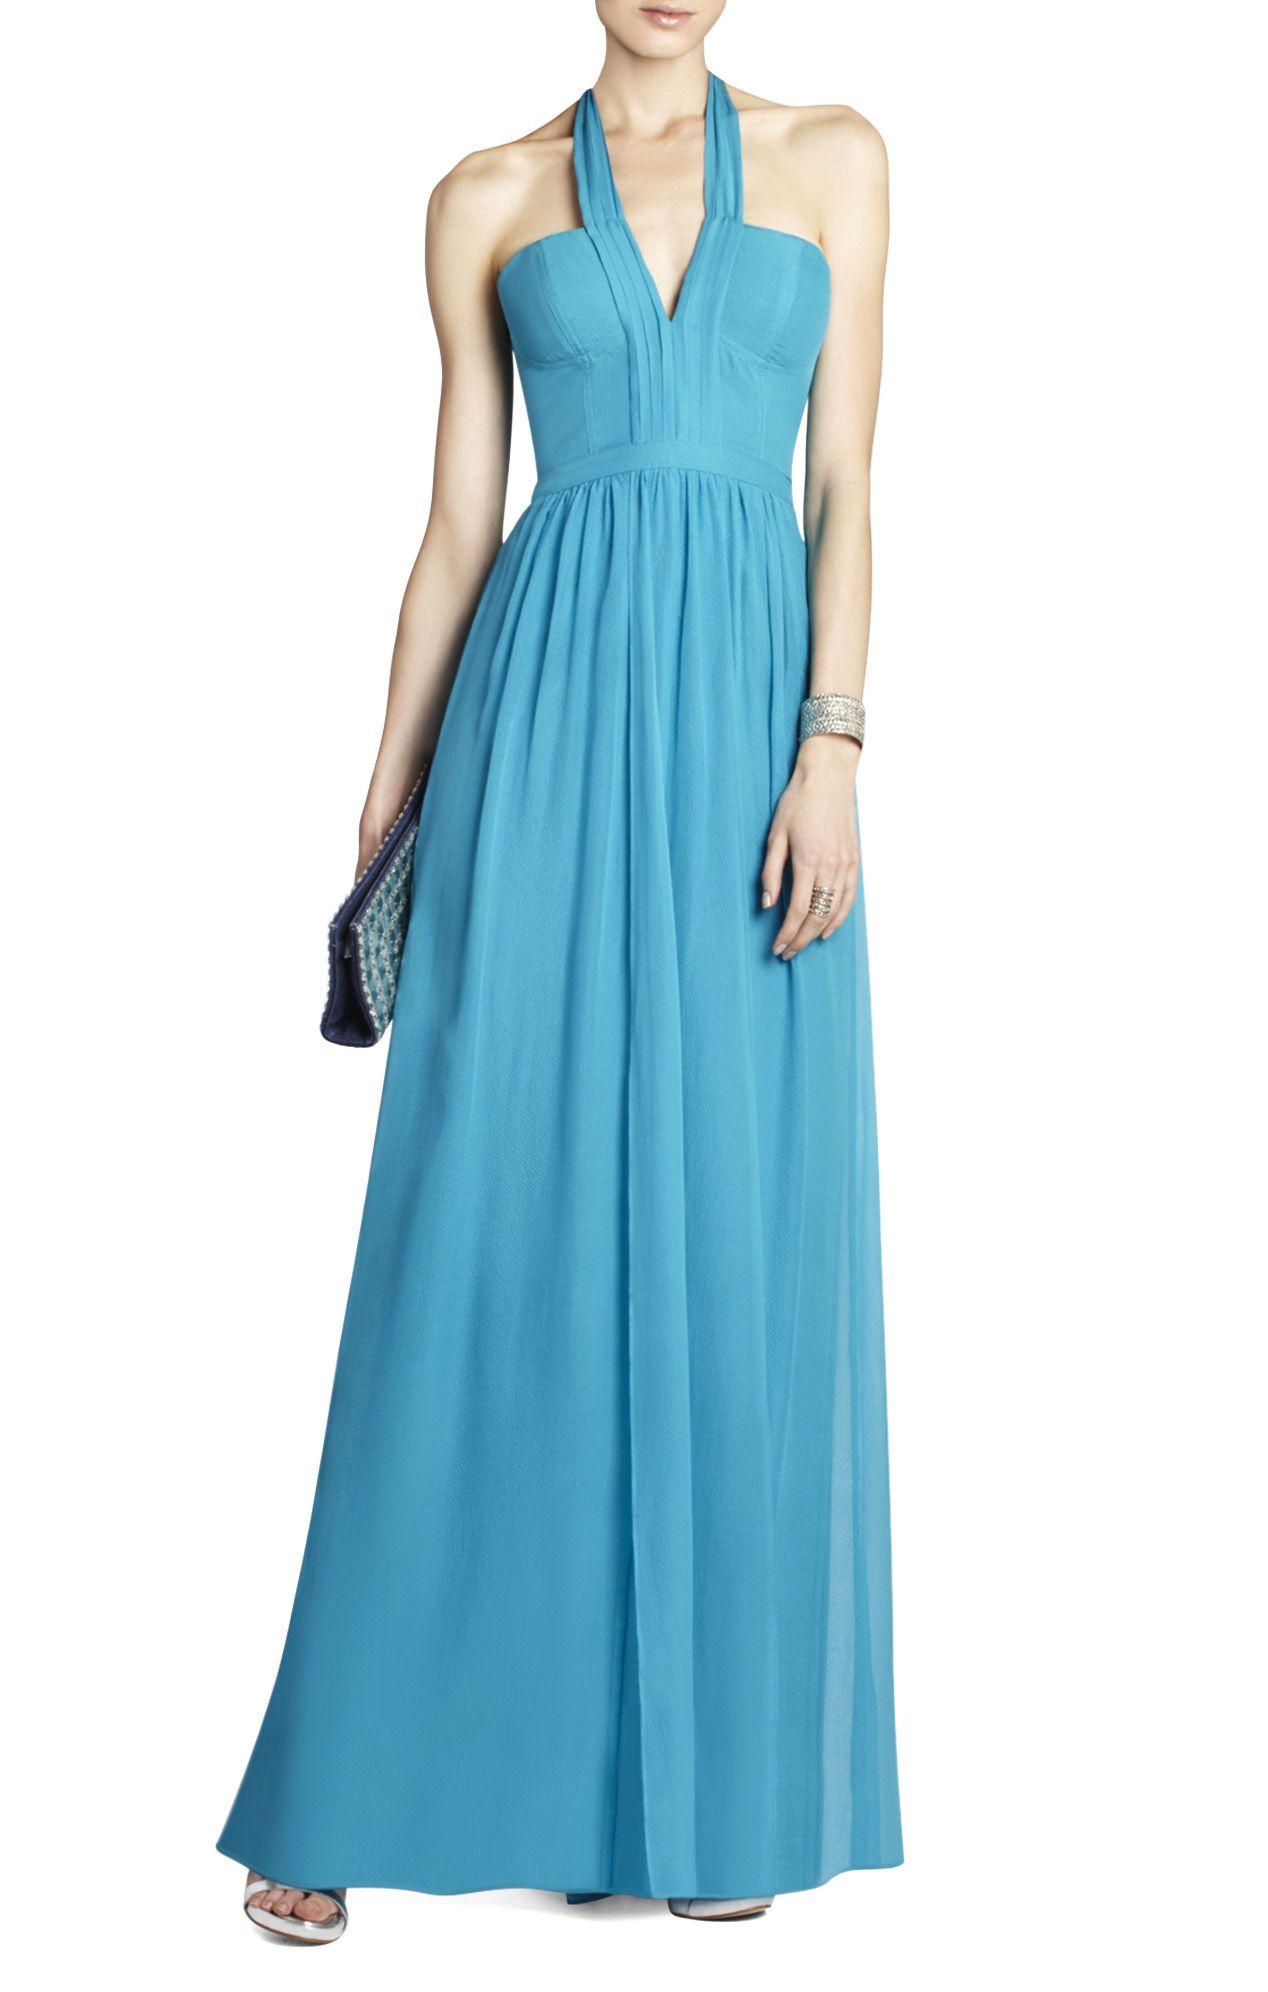 Colorful Bcbg Party Dresses Sketch - All Wedding Dresses ...